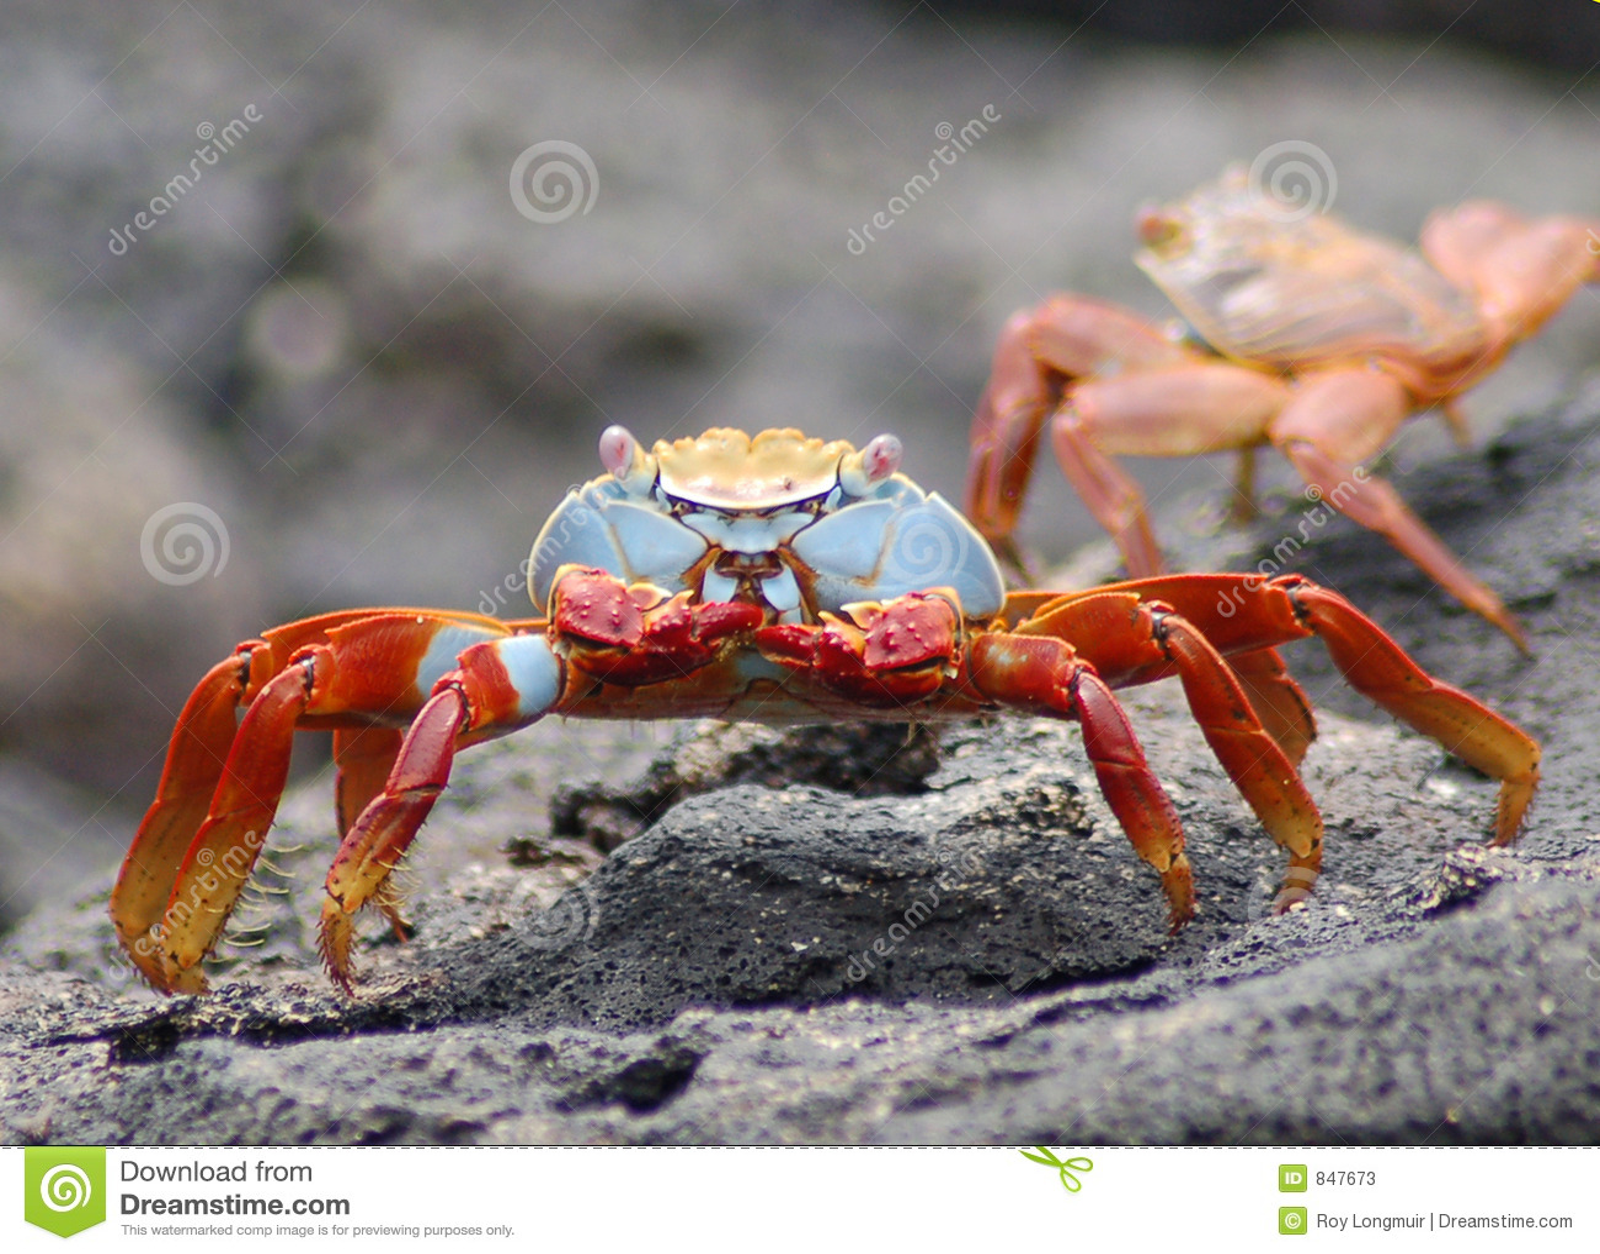 Crabe ewe - Page 2 Crabe-de-lave-de-sally-lightfoot-847673